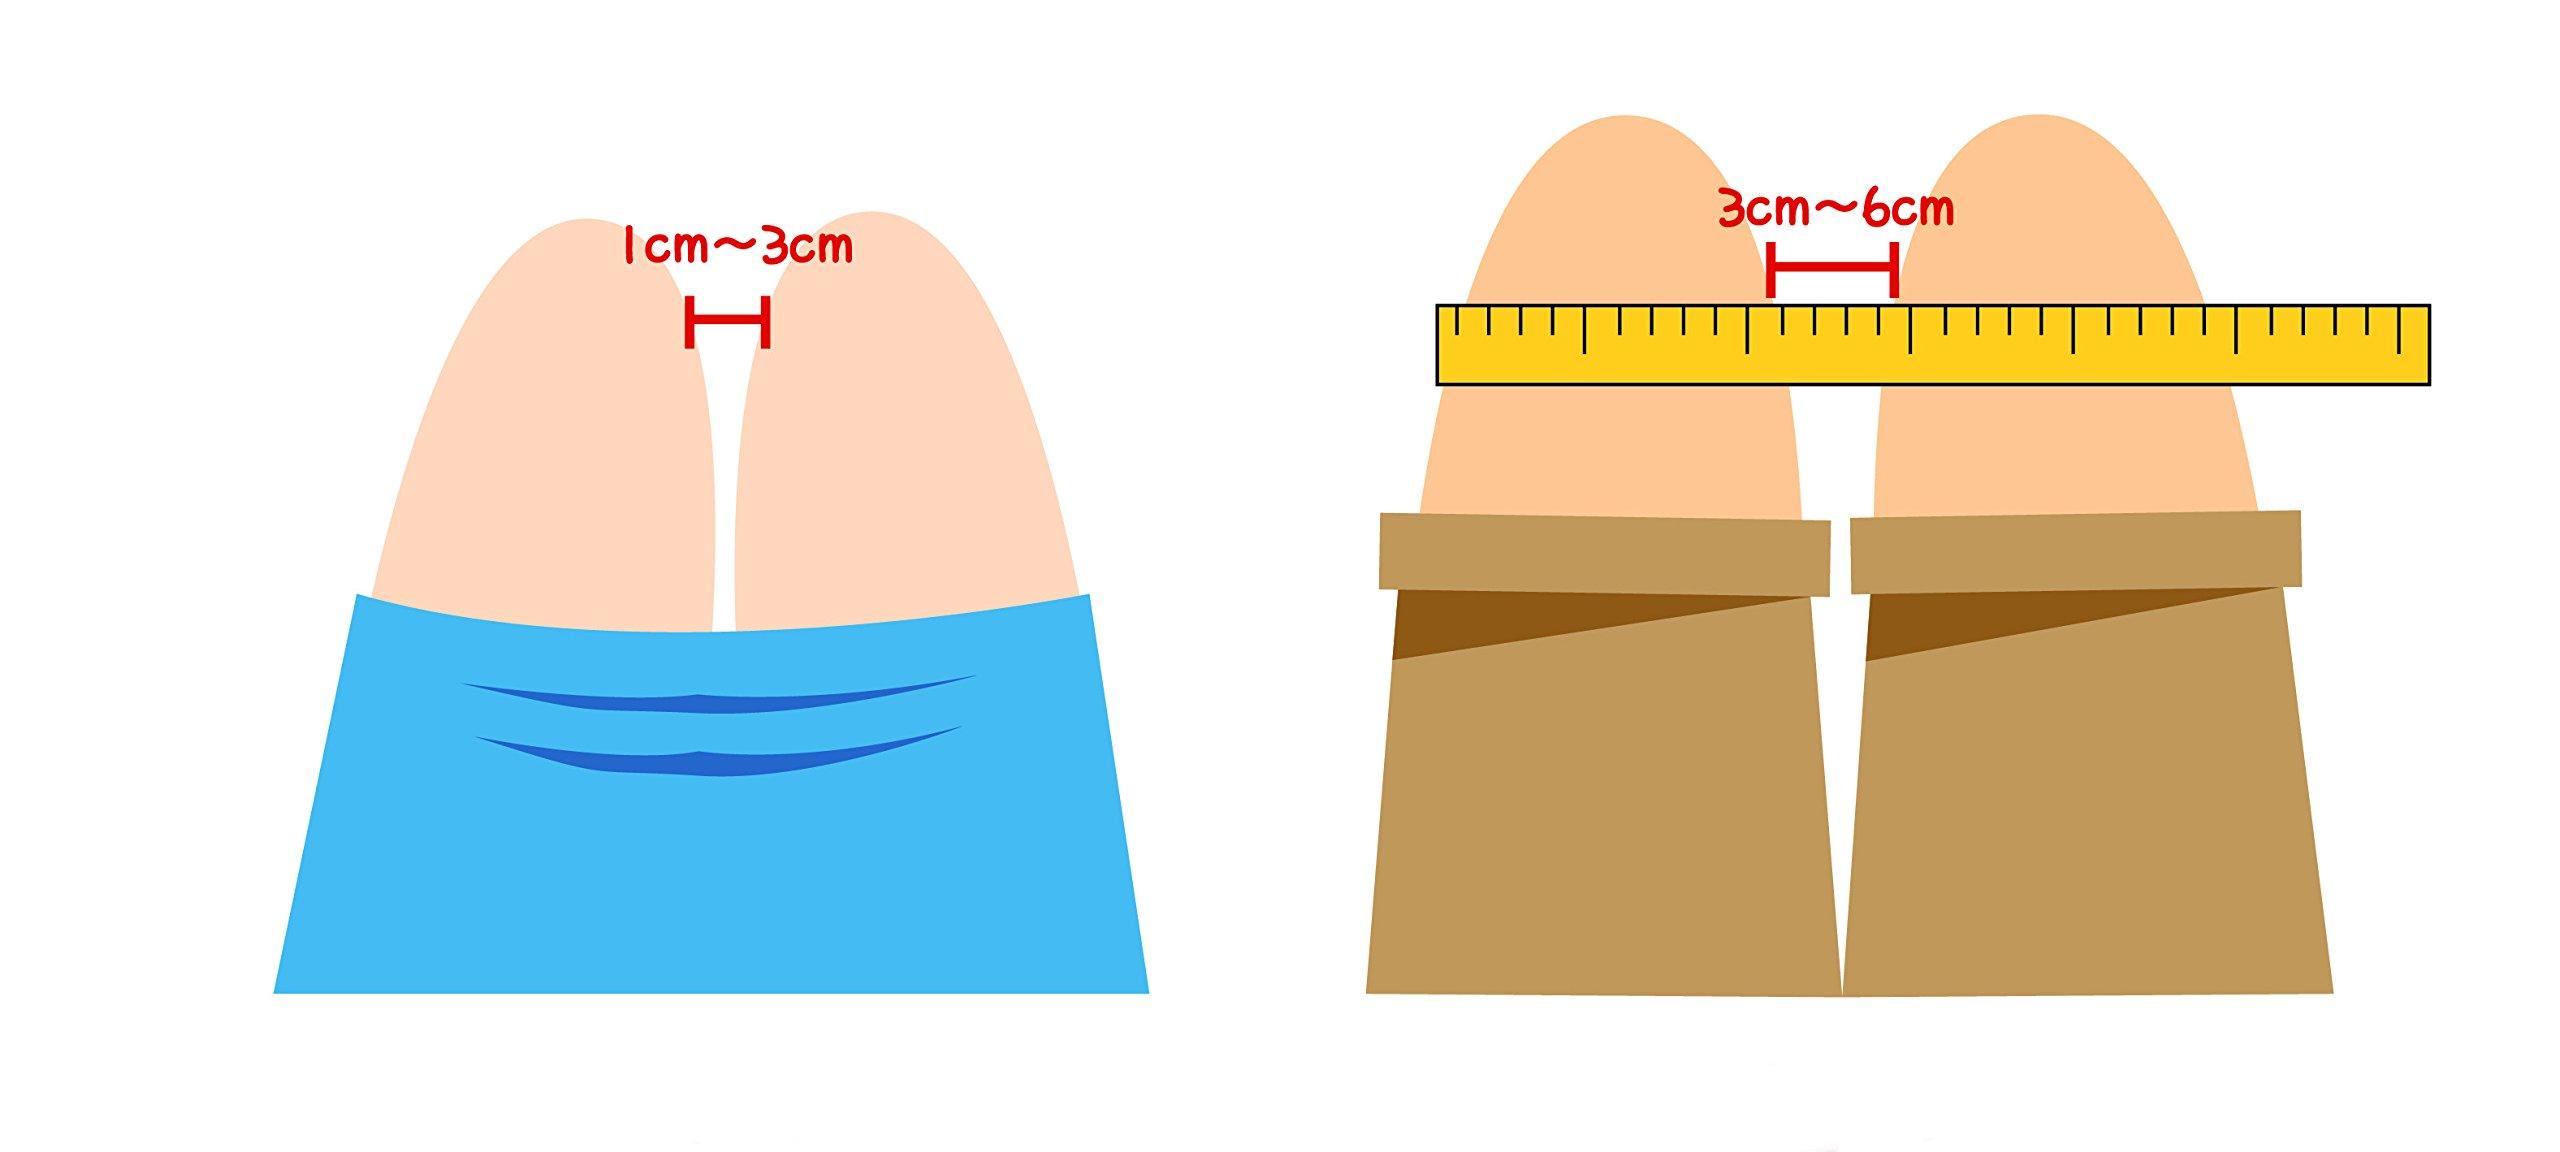 ALADDIN Limb Rest Portable Medical Posture Pelvis Hip Straightener Corrector Training Device Office School Home Travel (200)